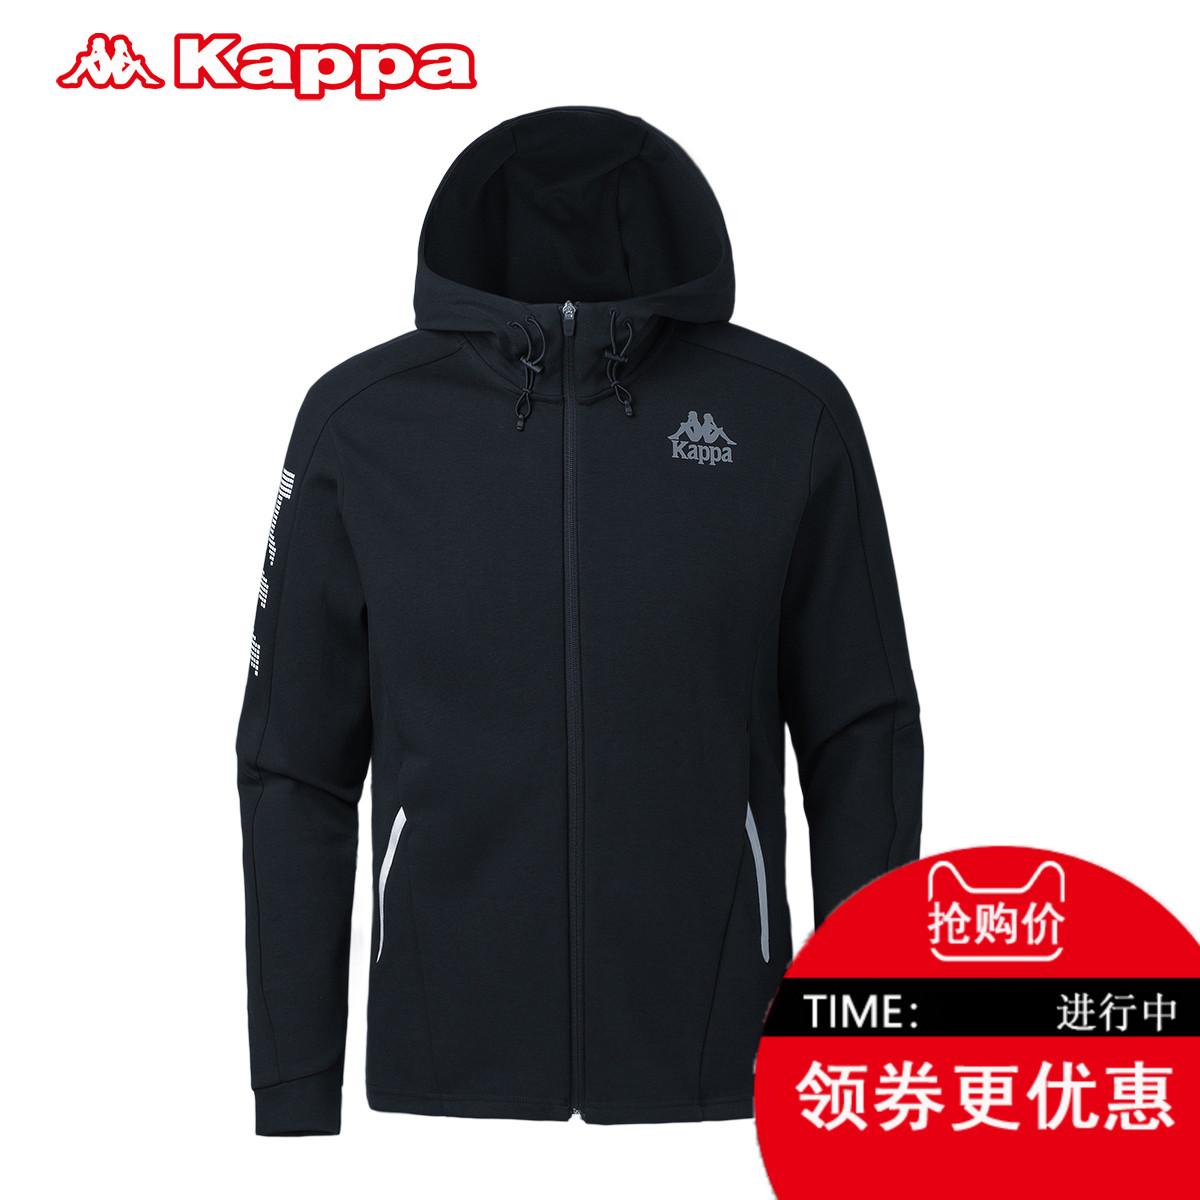 Kappa运动卫衣男装外套卡帕修身连帽运动服2018开衫上衣K0812MK05